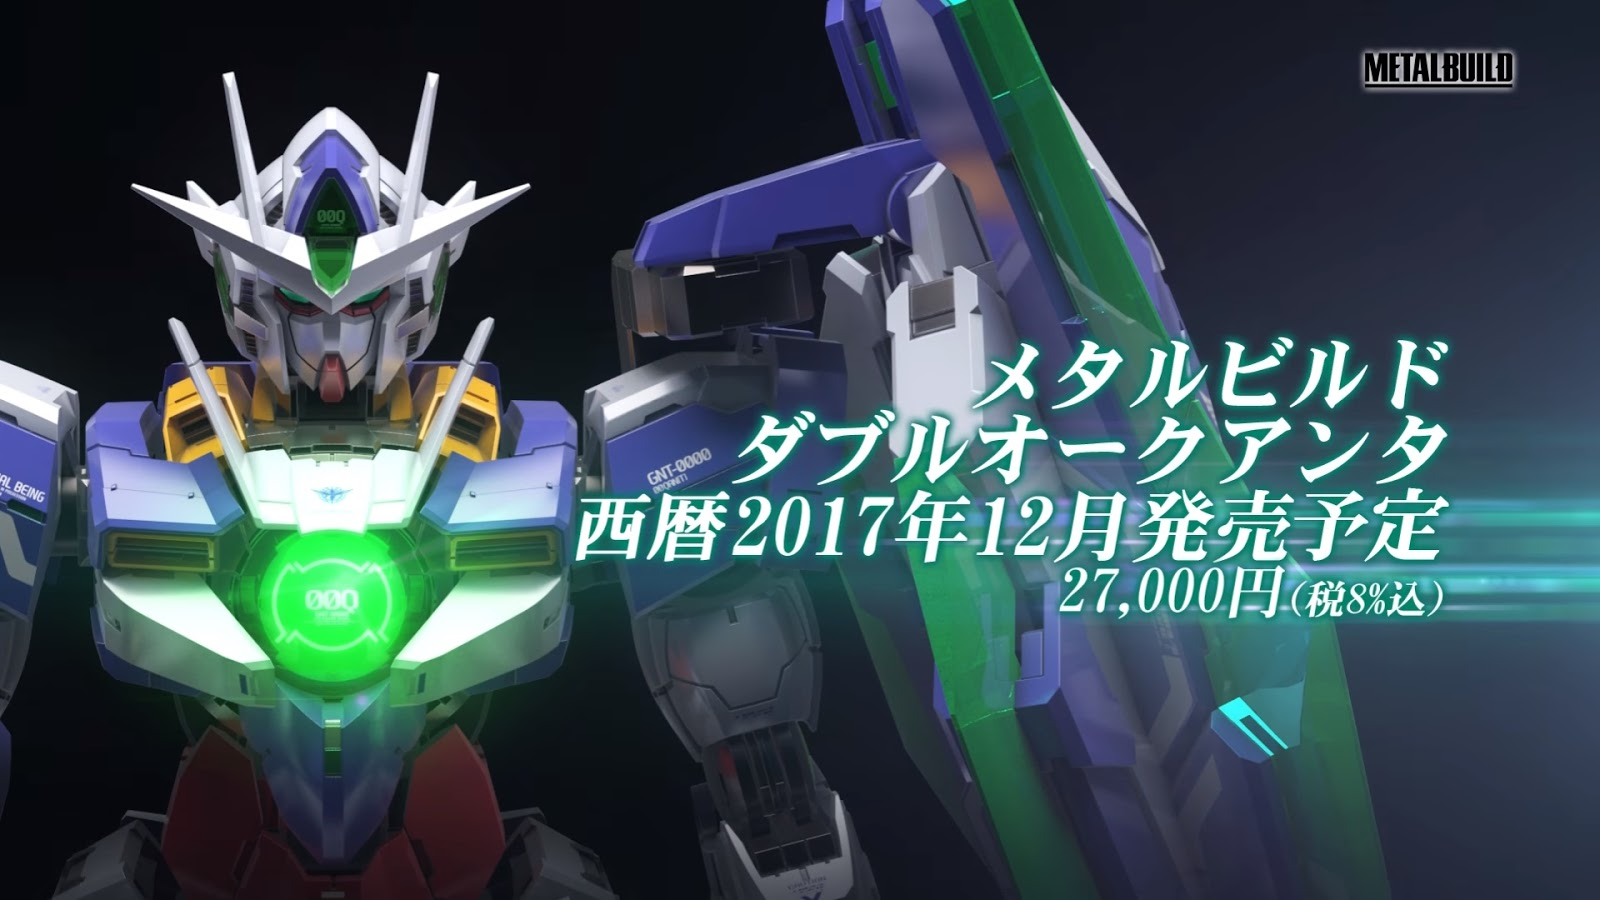 00 Qan T Wallpaper Gundam Quanta Movie Guy Rg Bandai 1 144 Hgoo Gnt 0000 Qant Qanta Metal Build Release Info Kits